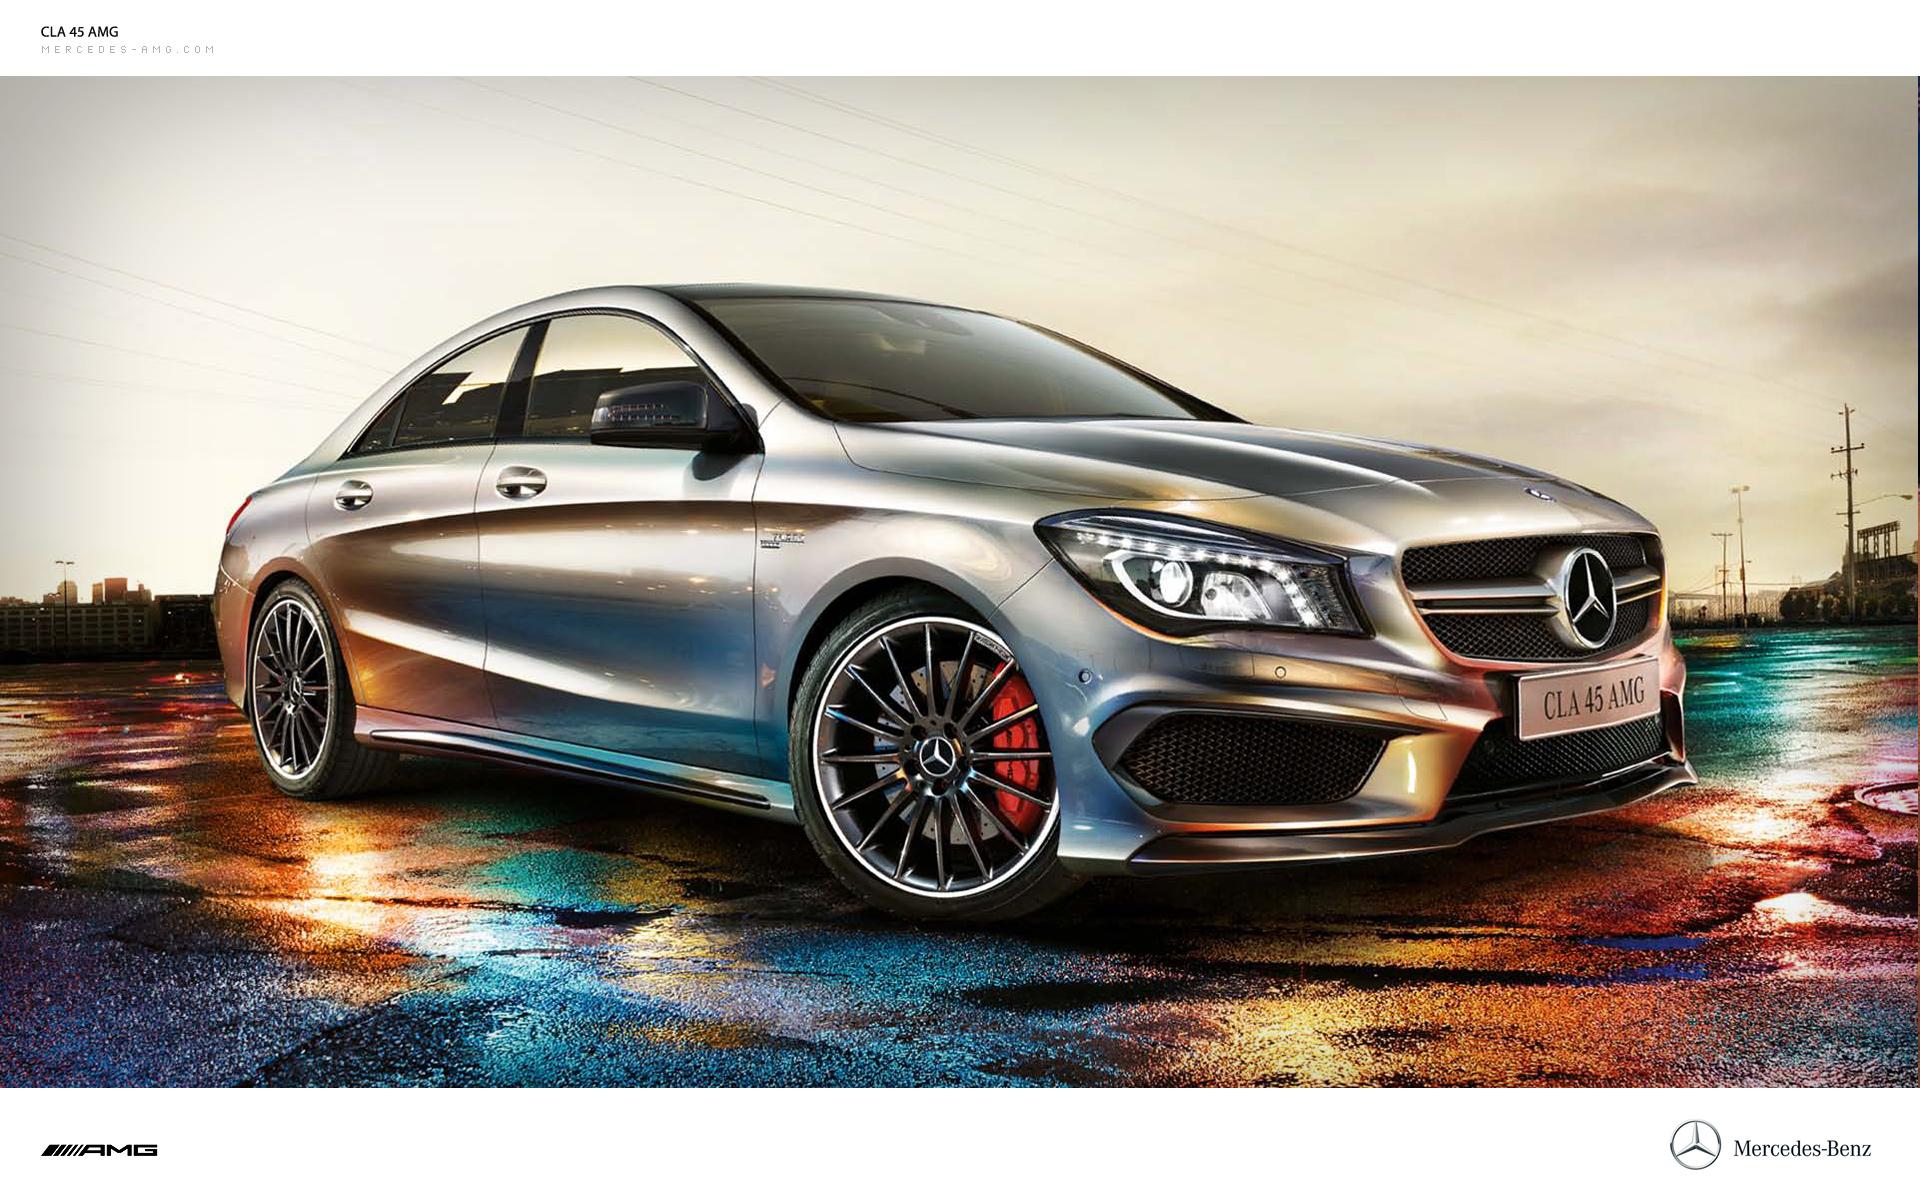 Mercedes CLA AMG